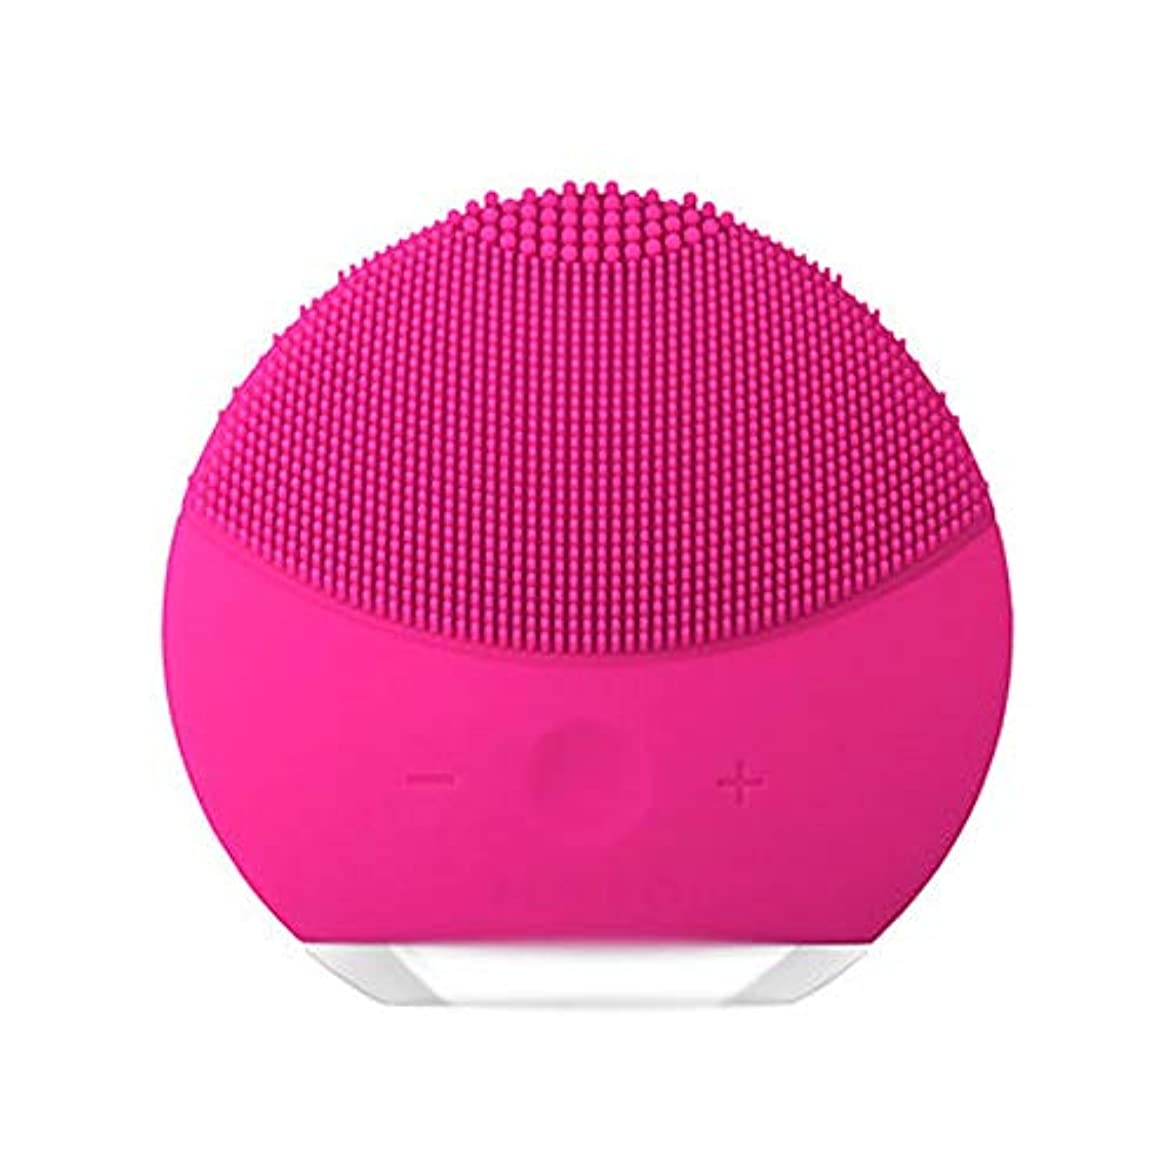 HEHUIHUI- クレンジングブラシ、ディープクレンジングフェイシャル、防水性と振動性のクレンジングブラシ、アンチエイジング、優しい角質除去とマッサージ(ピンク) (Color : Red)